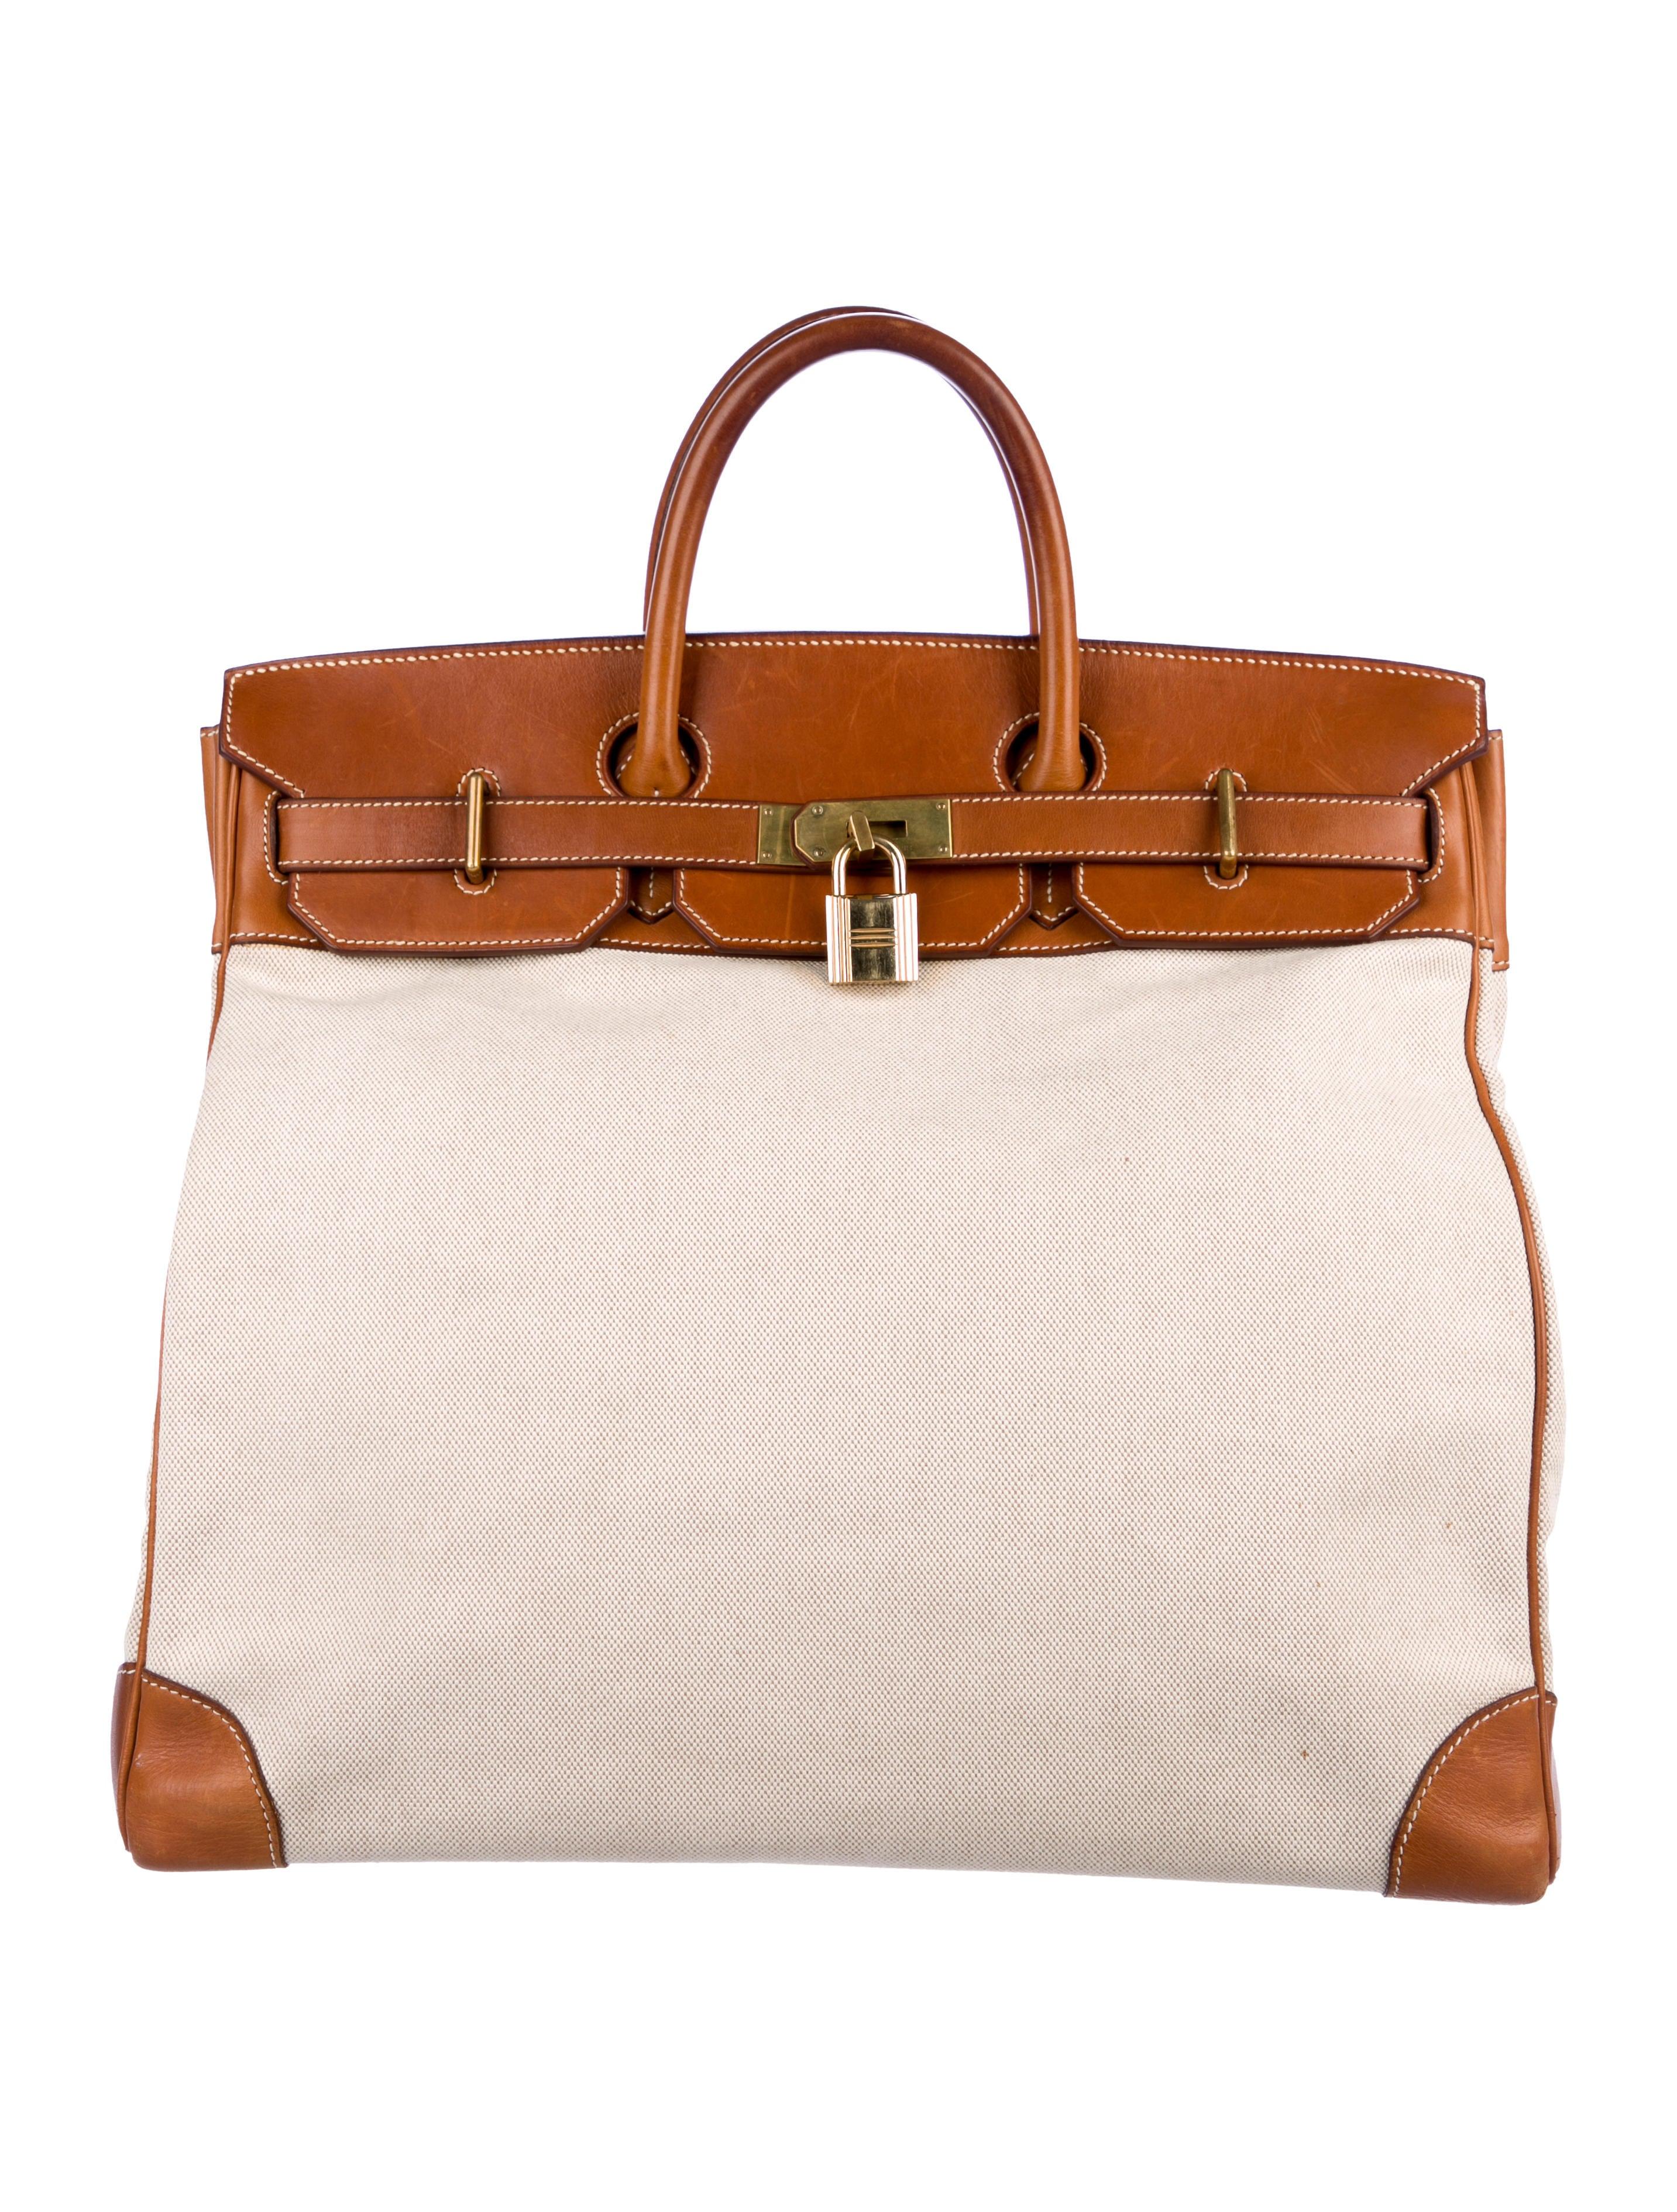 0497bdc1a6af Hermès Toile Natural Barenia HAC Birkin 45 - Bags - HER159878